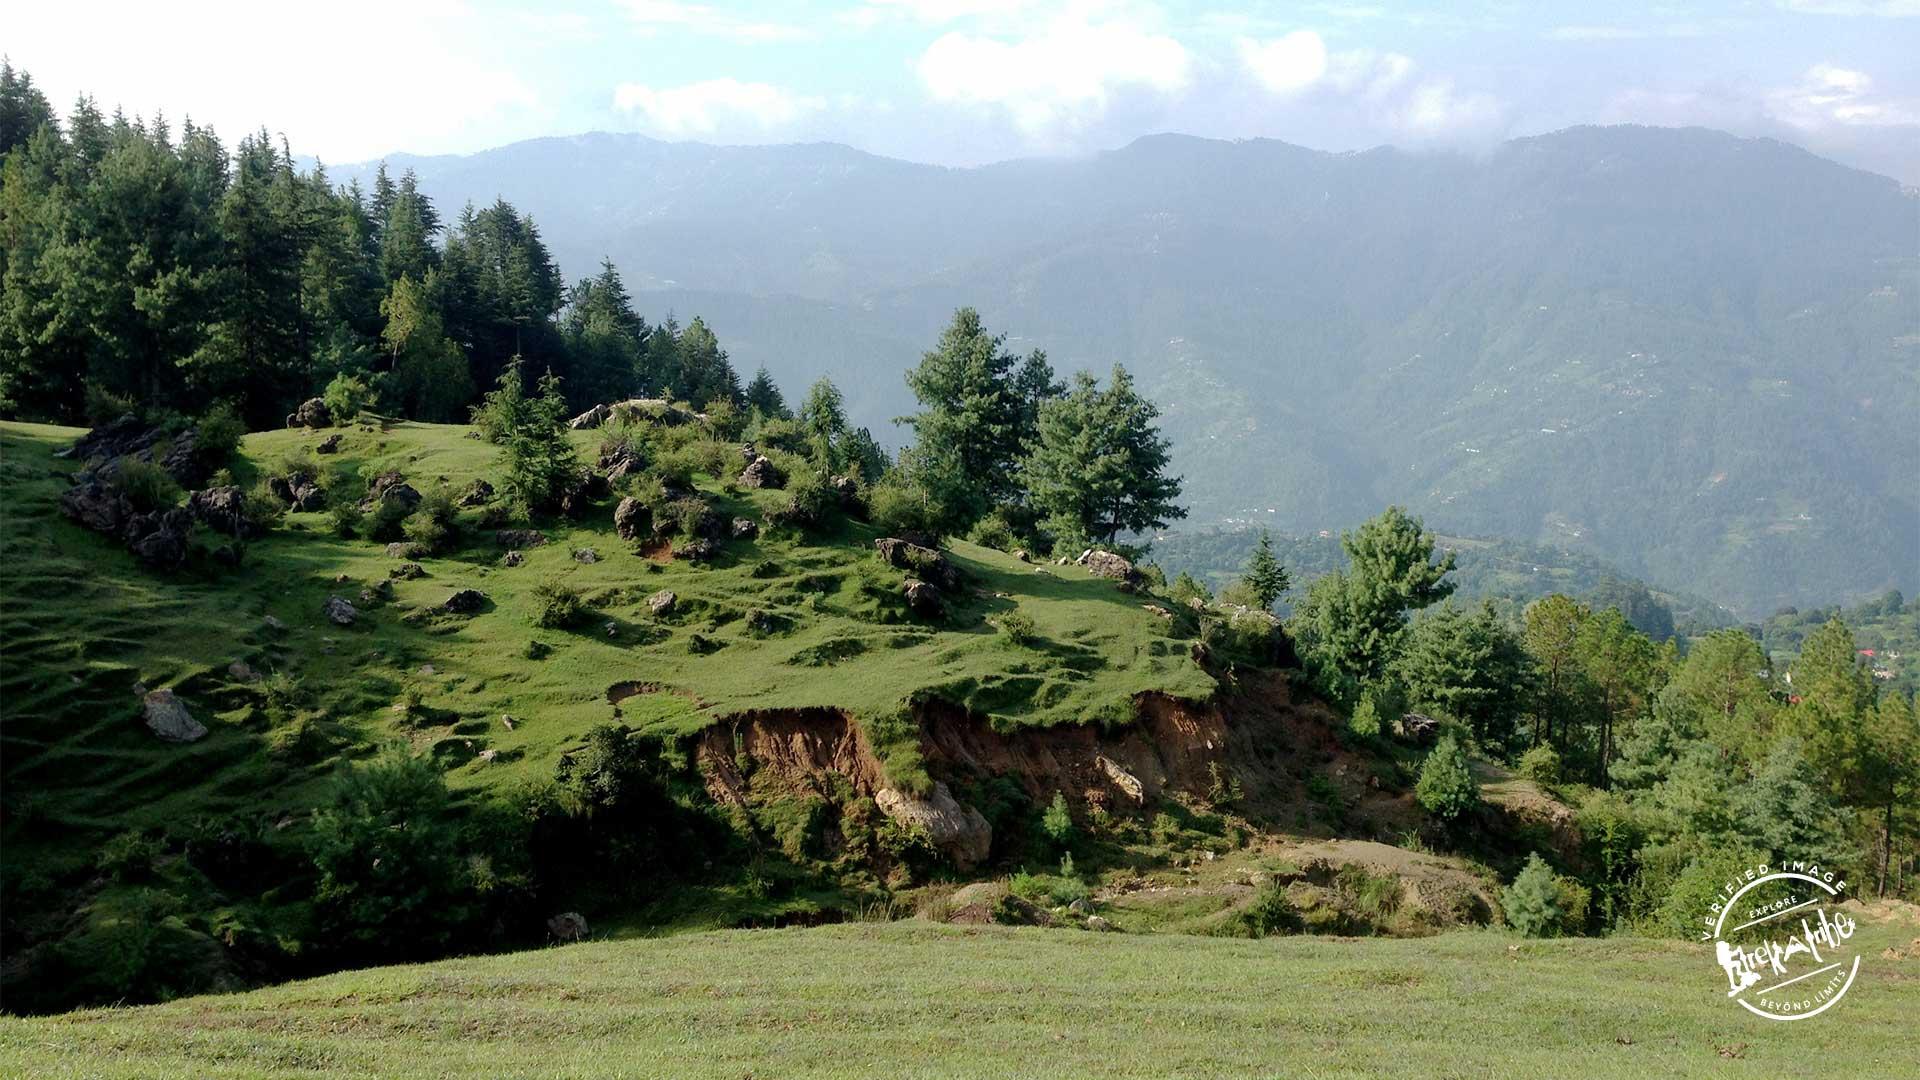 Trek To Shali Tibba - Shimla